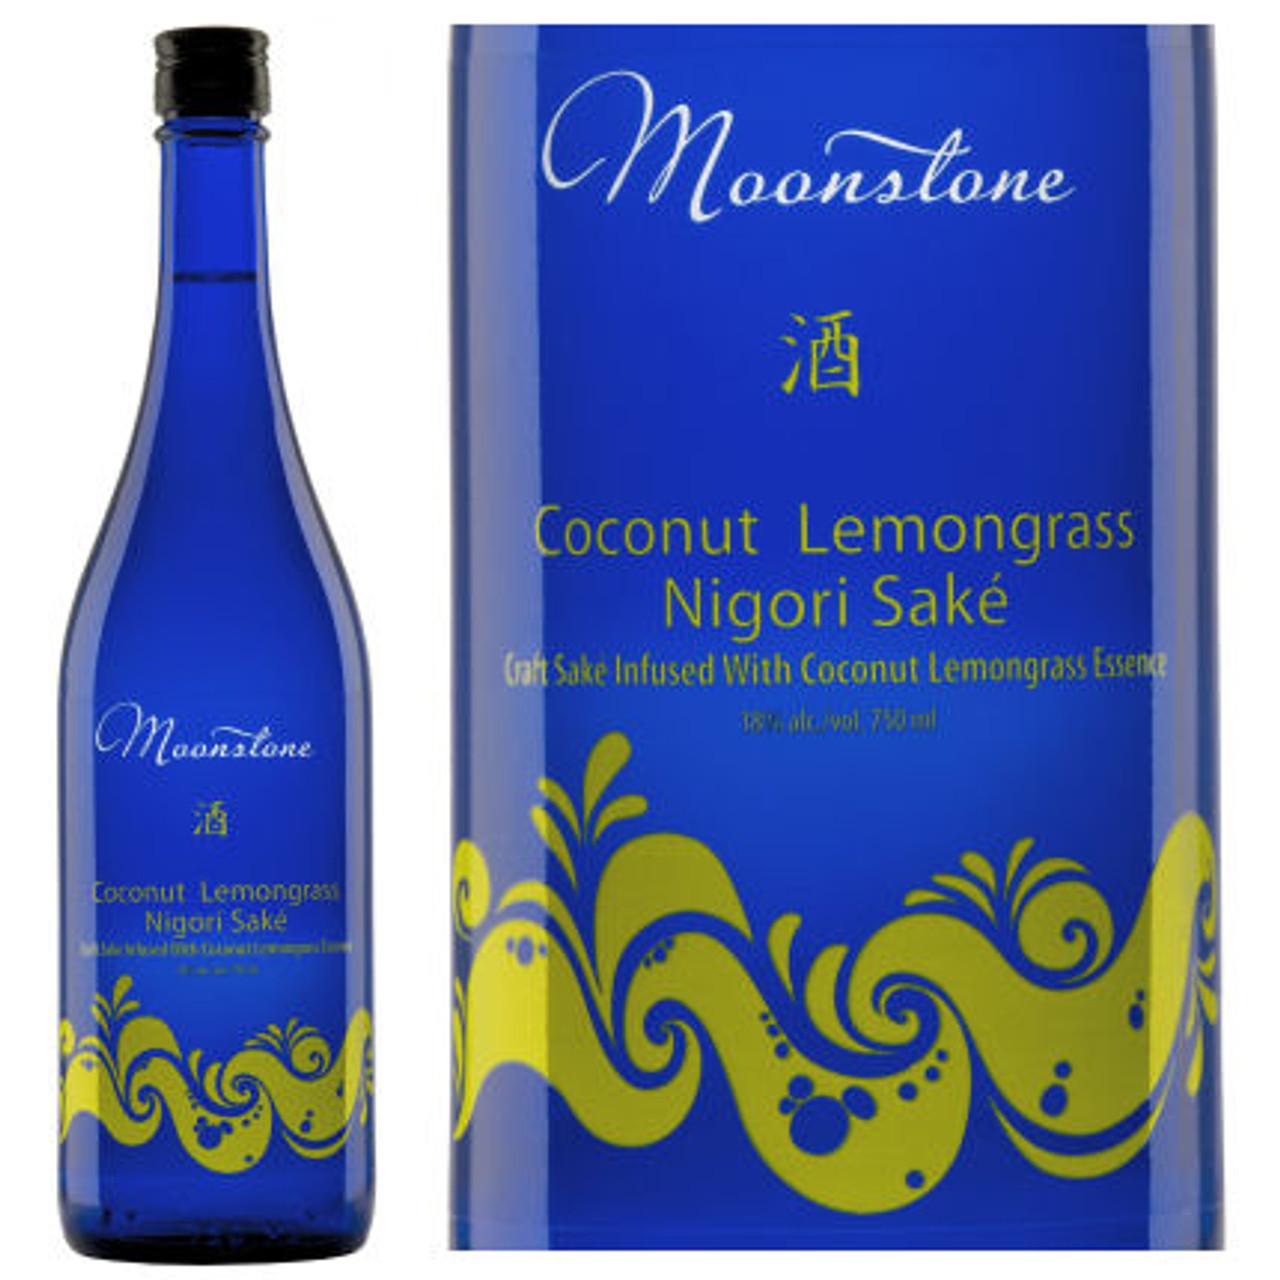 Moonstone Coconut Lemongrass Infused Nigori Sake 375ml